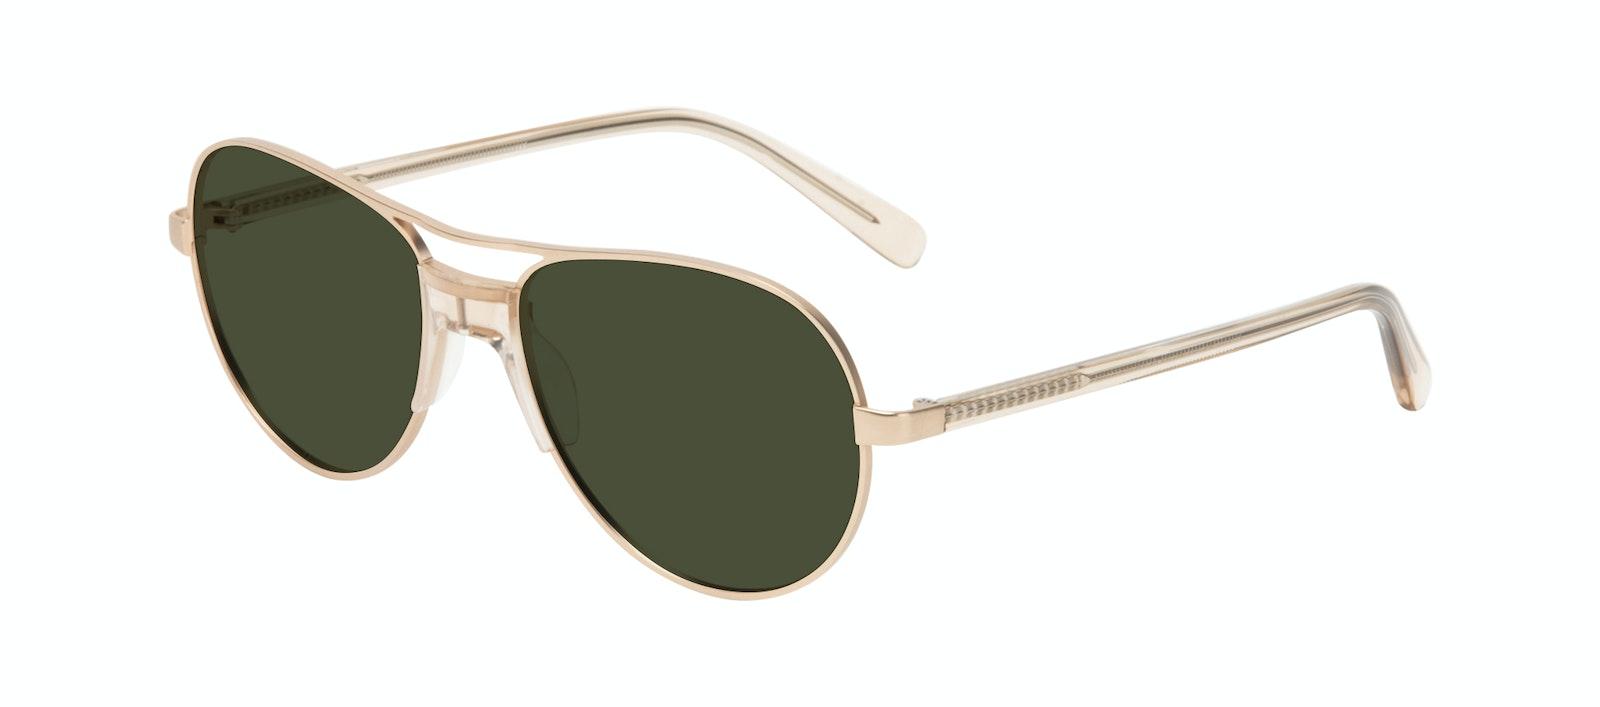 Affordable Fashion Glasses Aviator Sunglasses Women Ultimate Gold Tilt